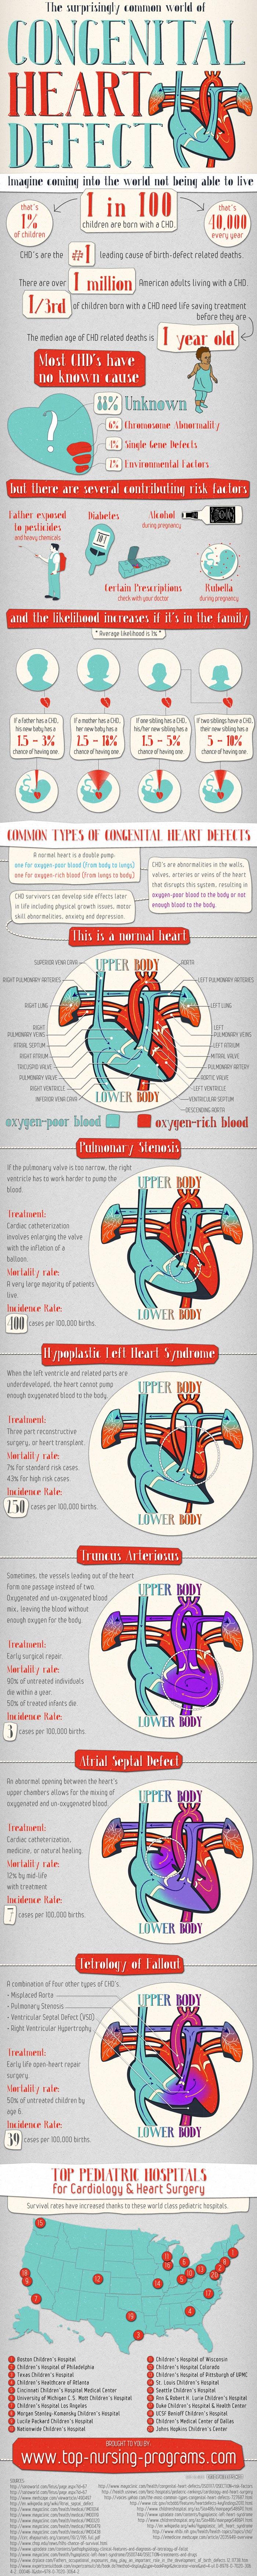 Congenital Heart Defects Statistics-Infographic